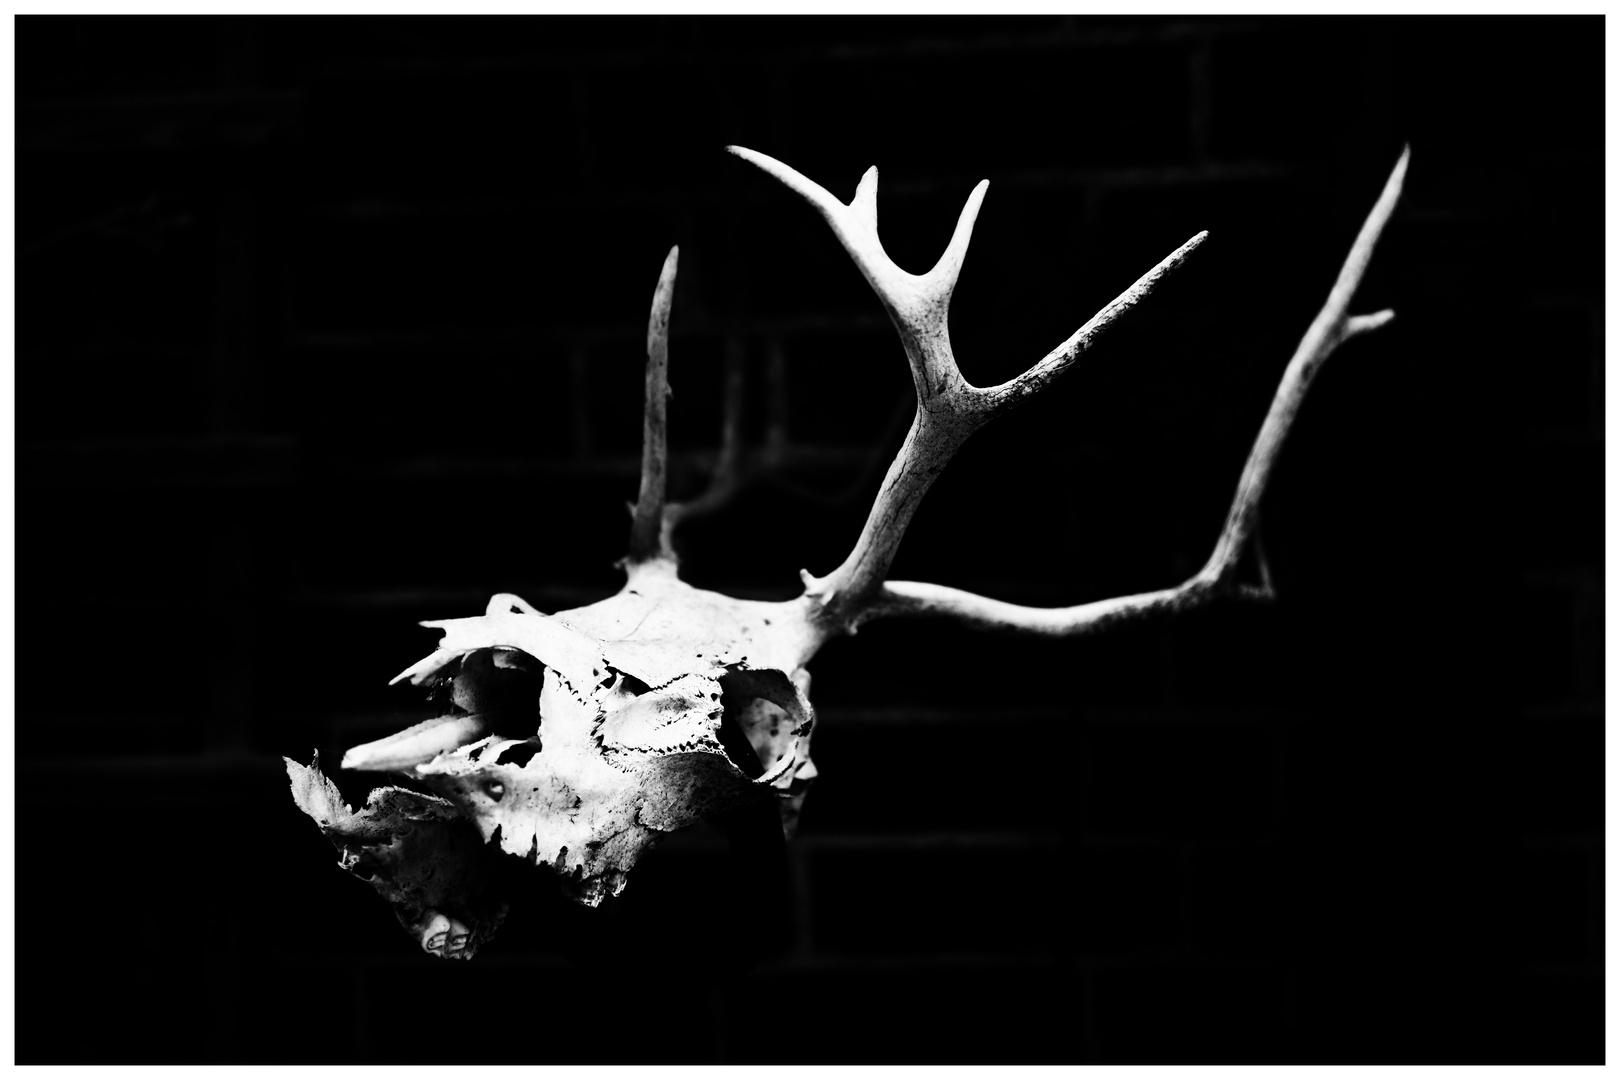 Skully the Hirsch